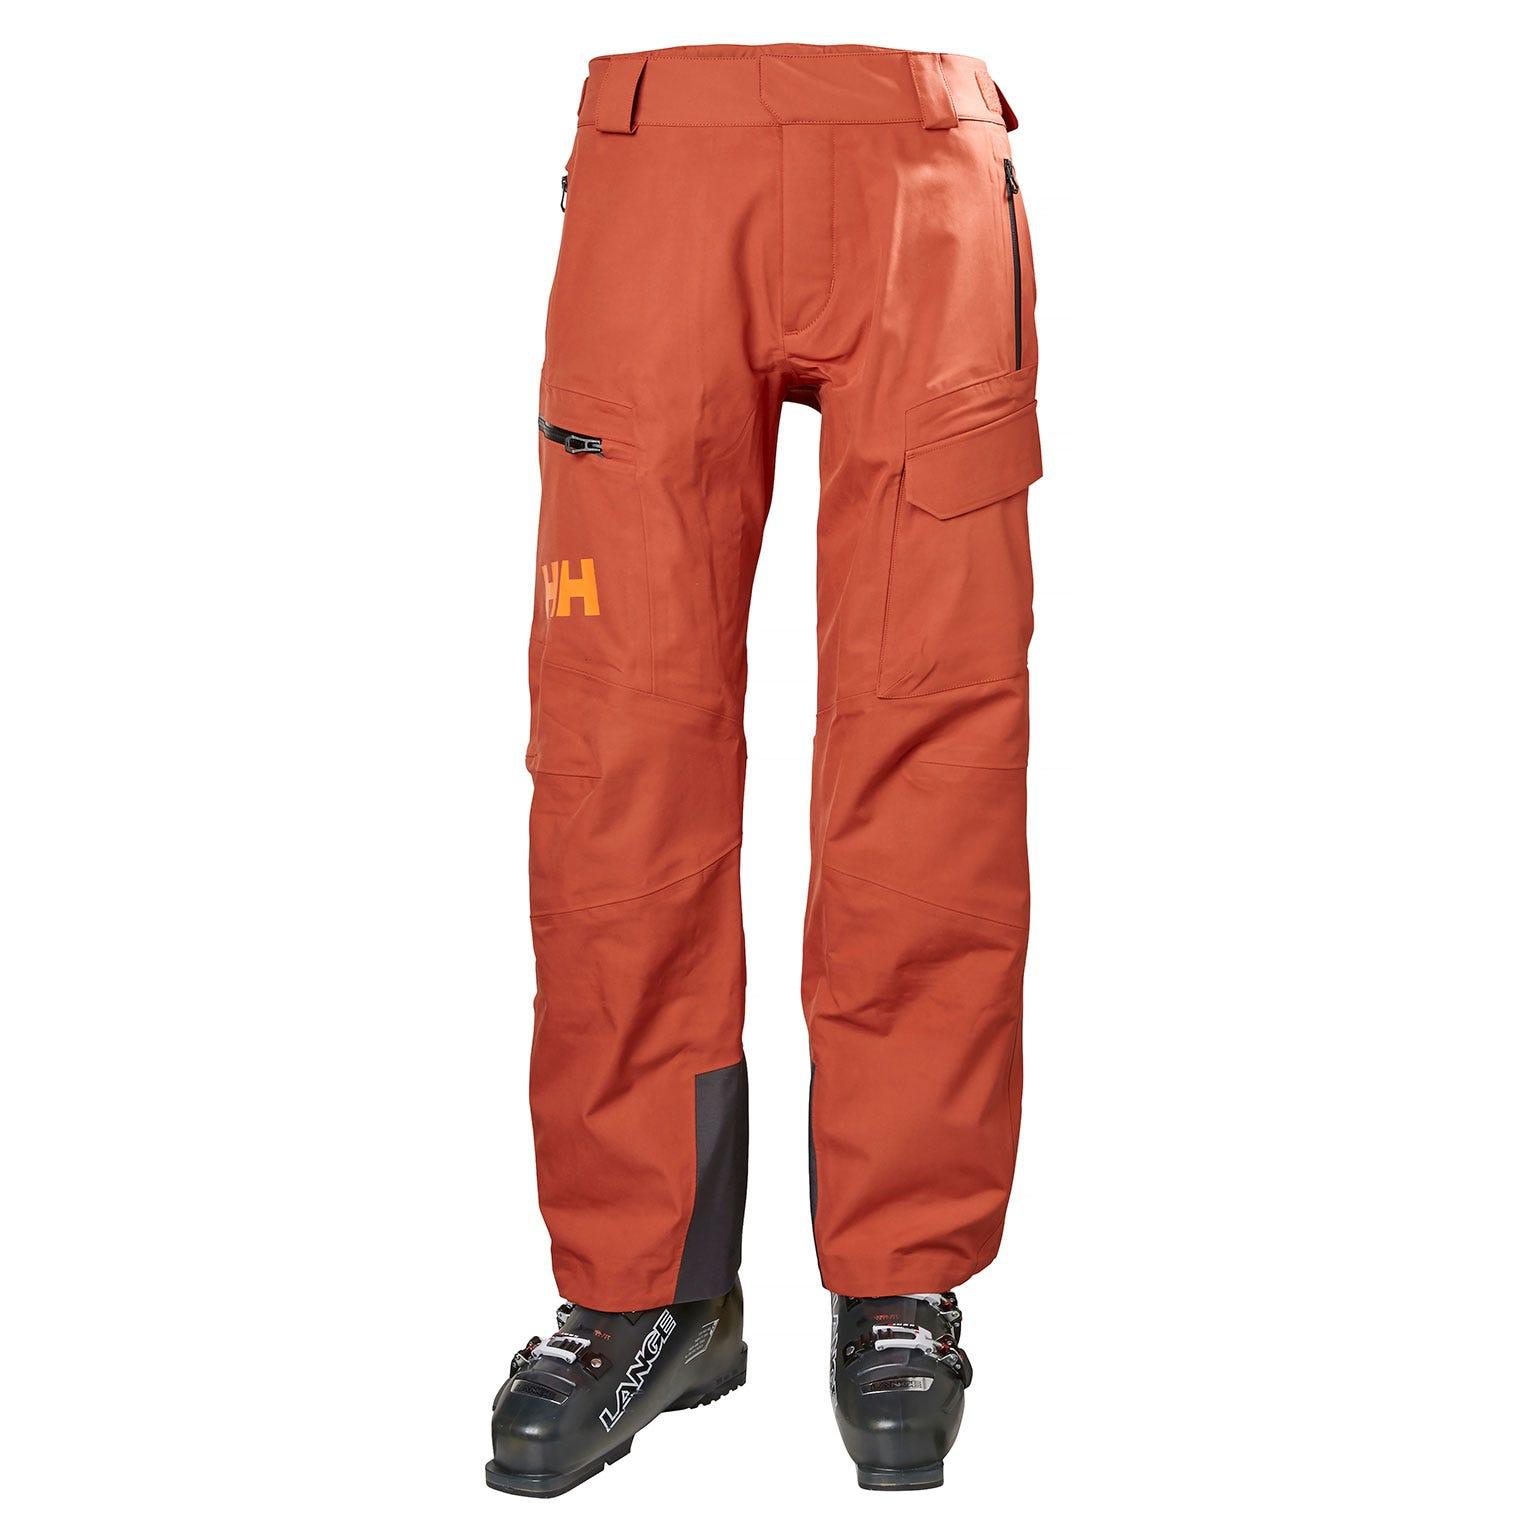 Helly Hansen Ridge Shell Pant Mens Ski Red M